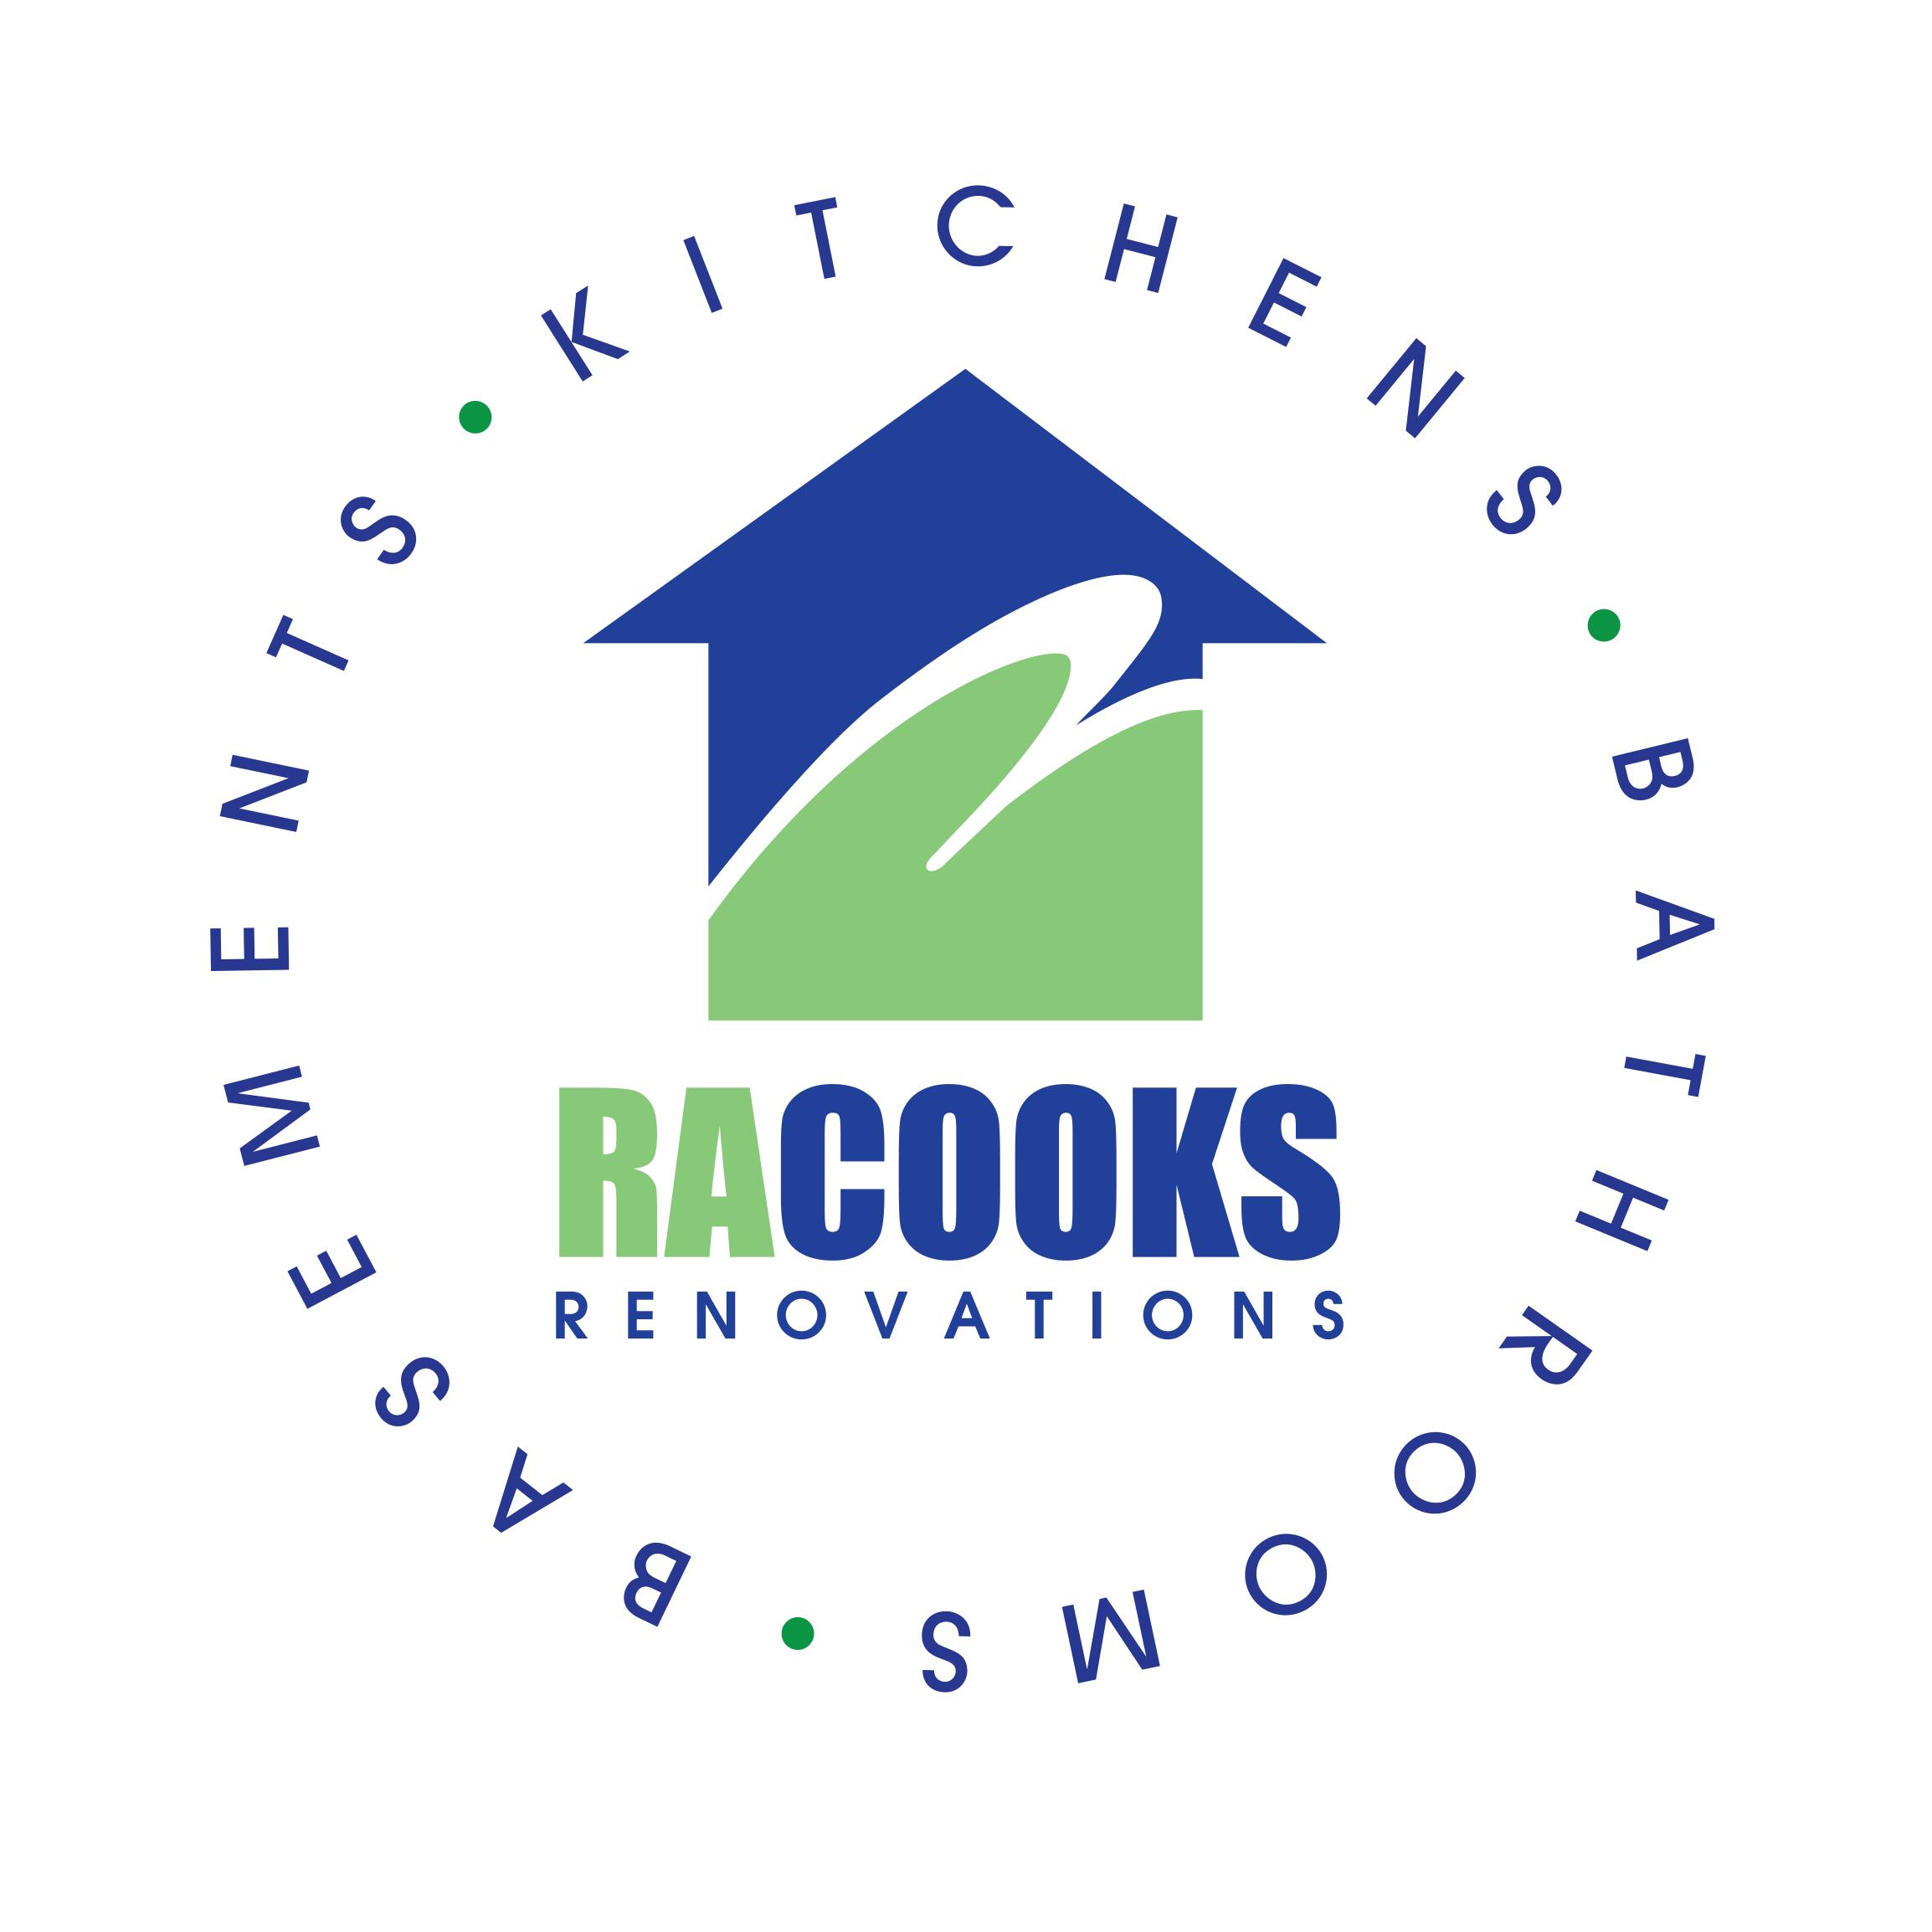 RA Cooks Renovations